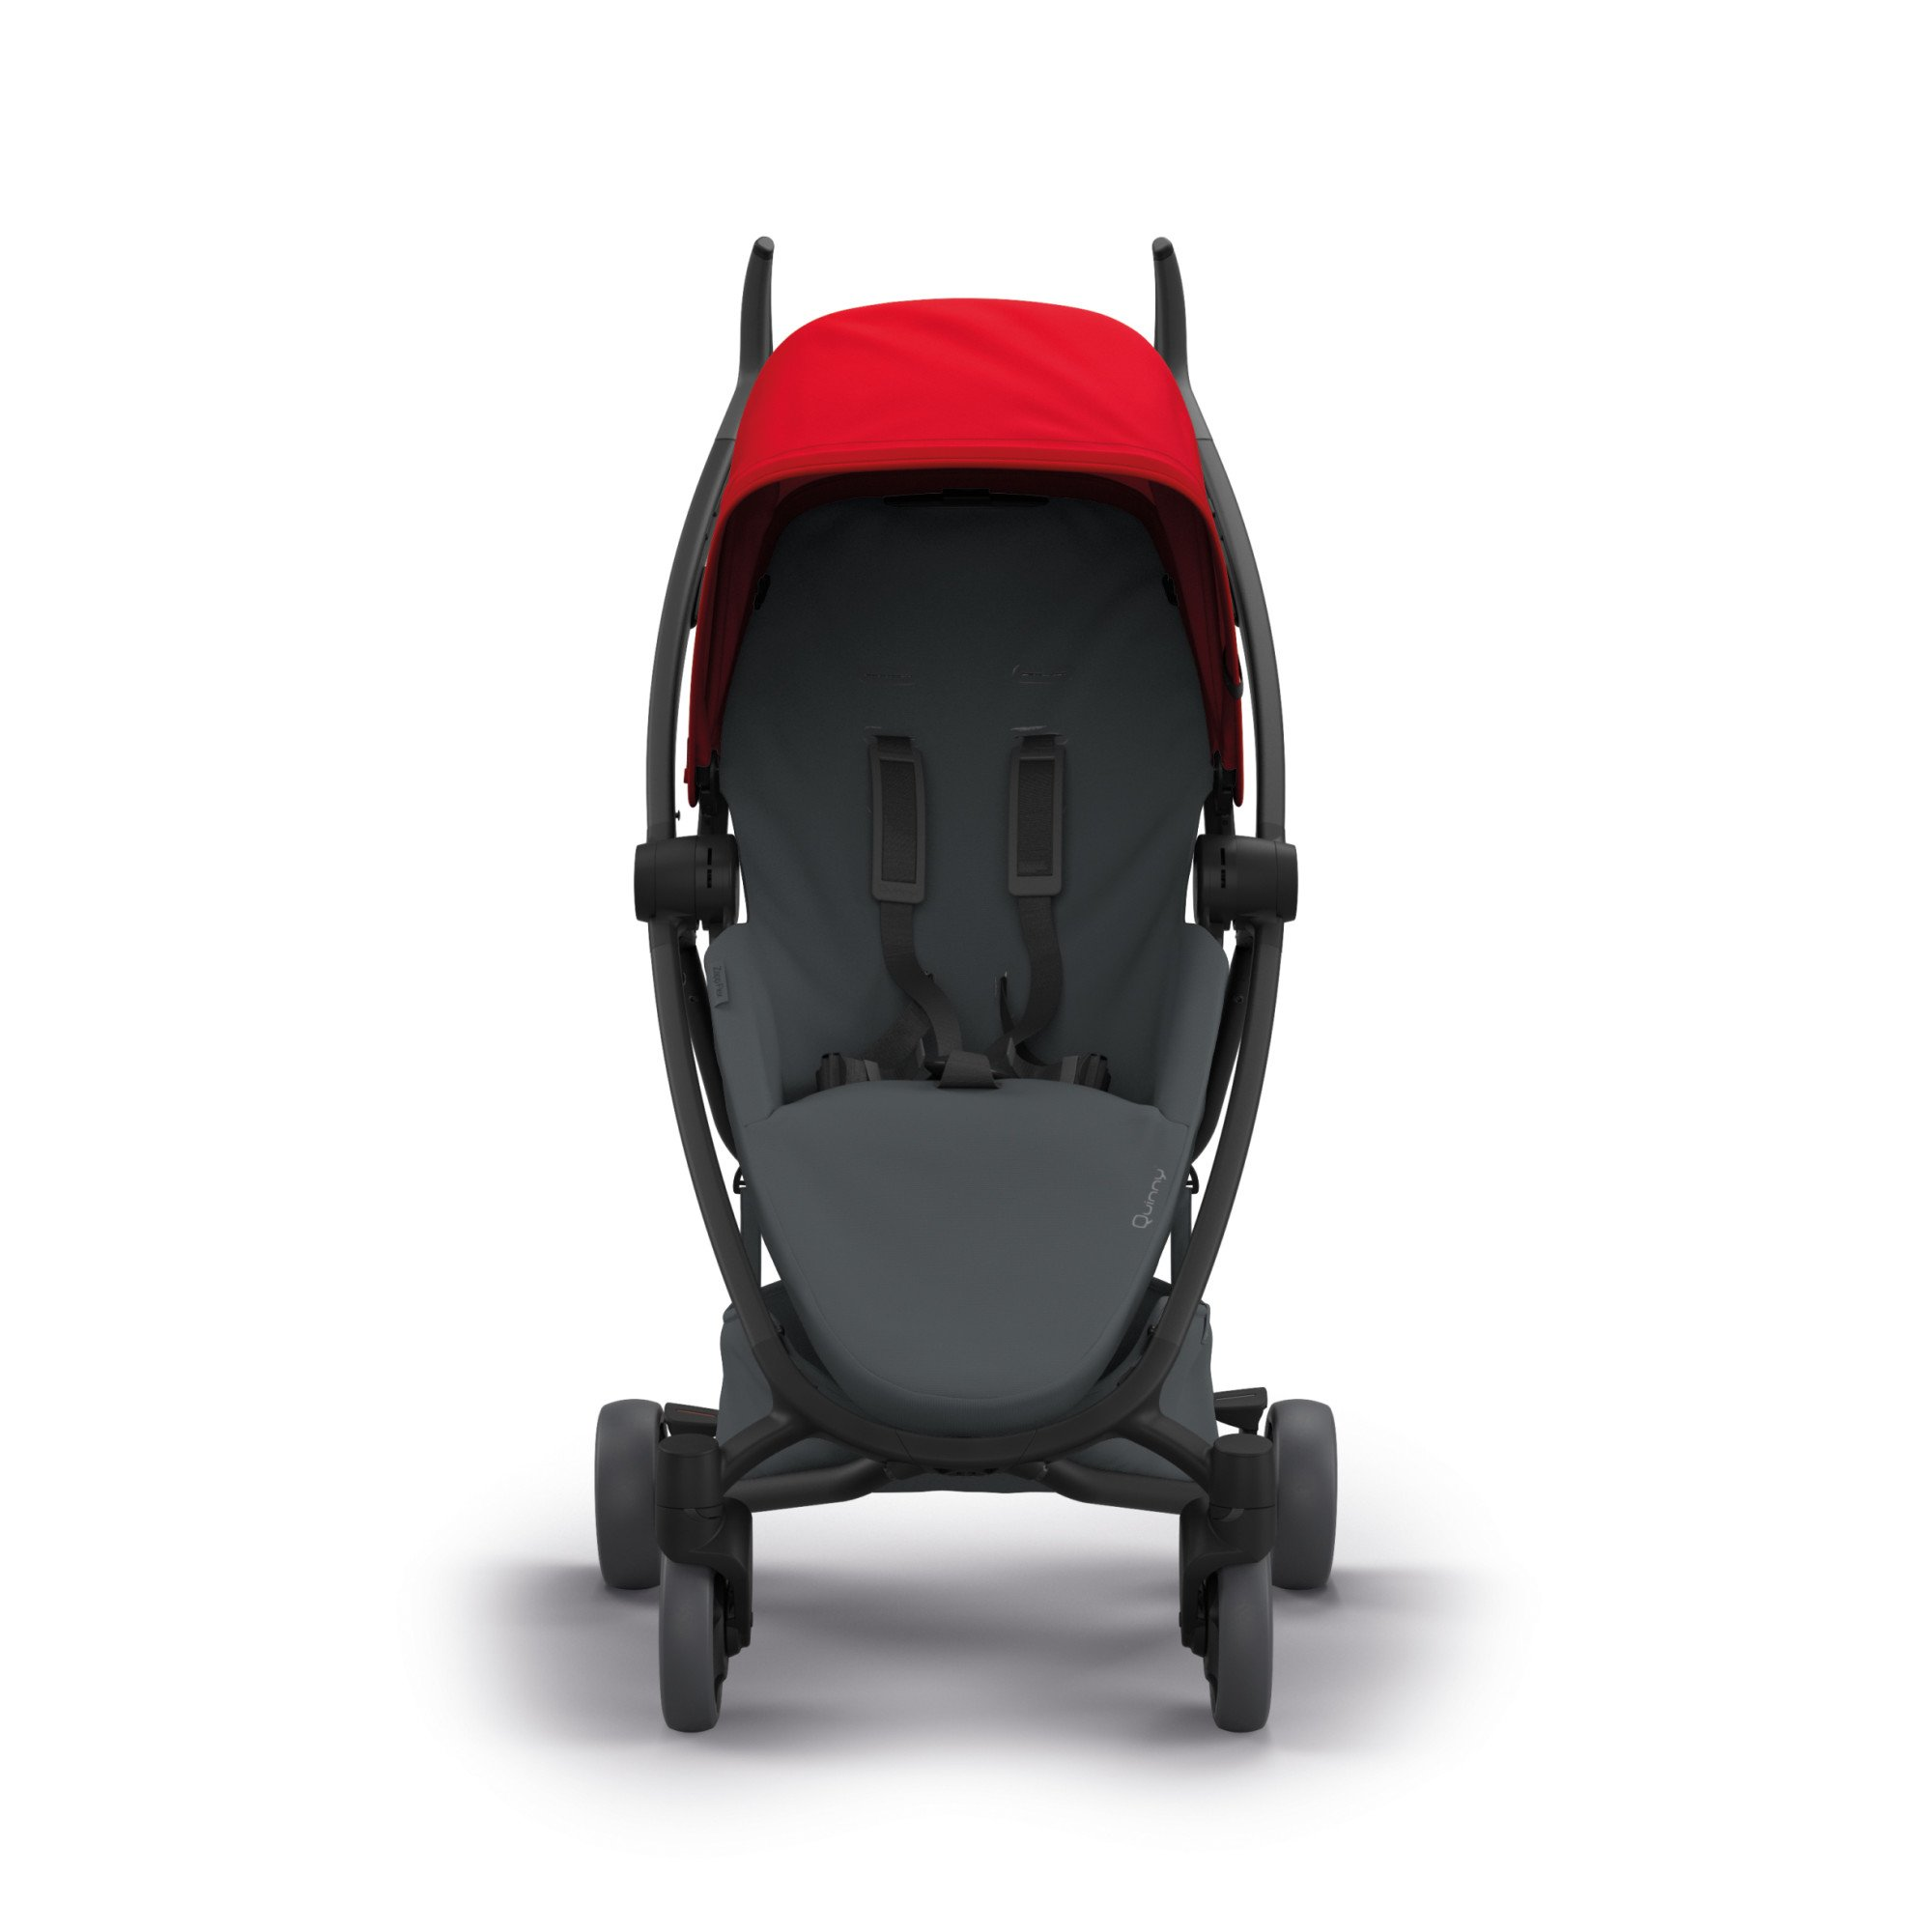 Quinny Zapp Flex Stroller, Red by Quinny (Image #7)